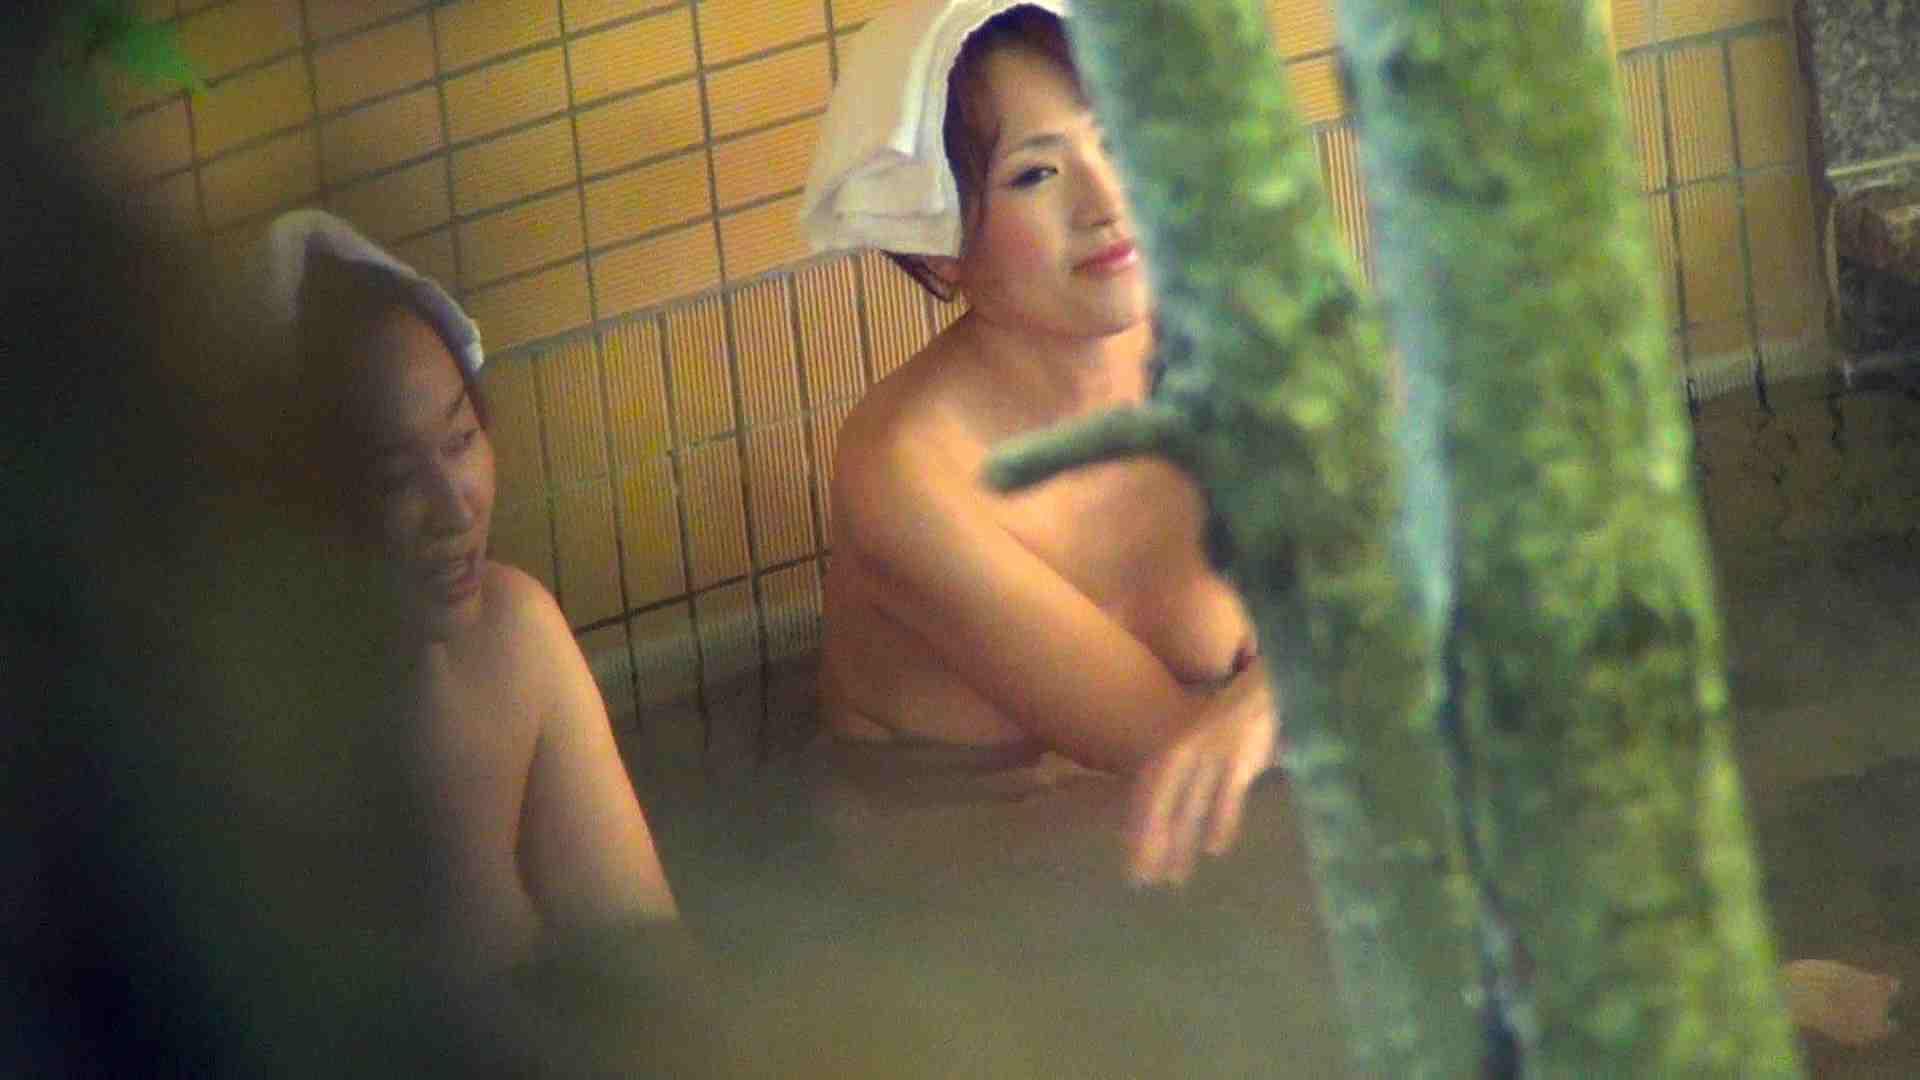 Aquaな露天風呂Vol.272 盗撮 われめAV動画紹介 99PICs 59